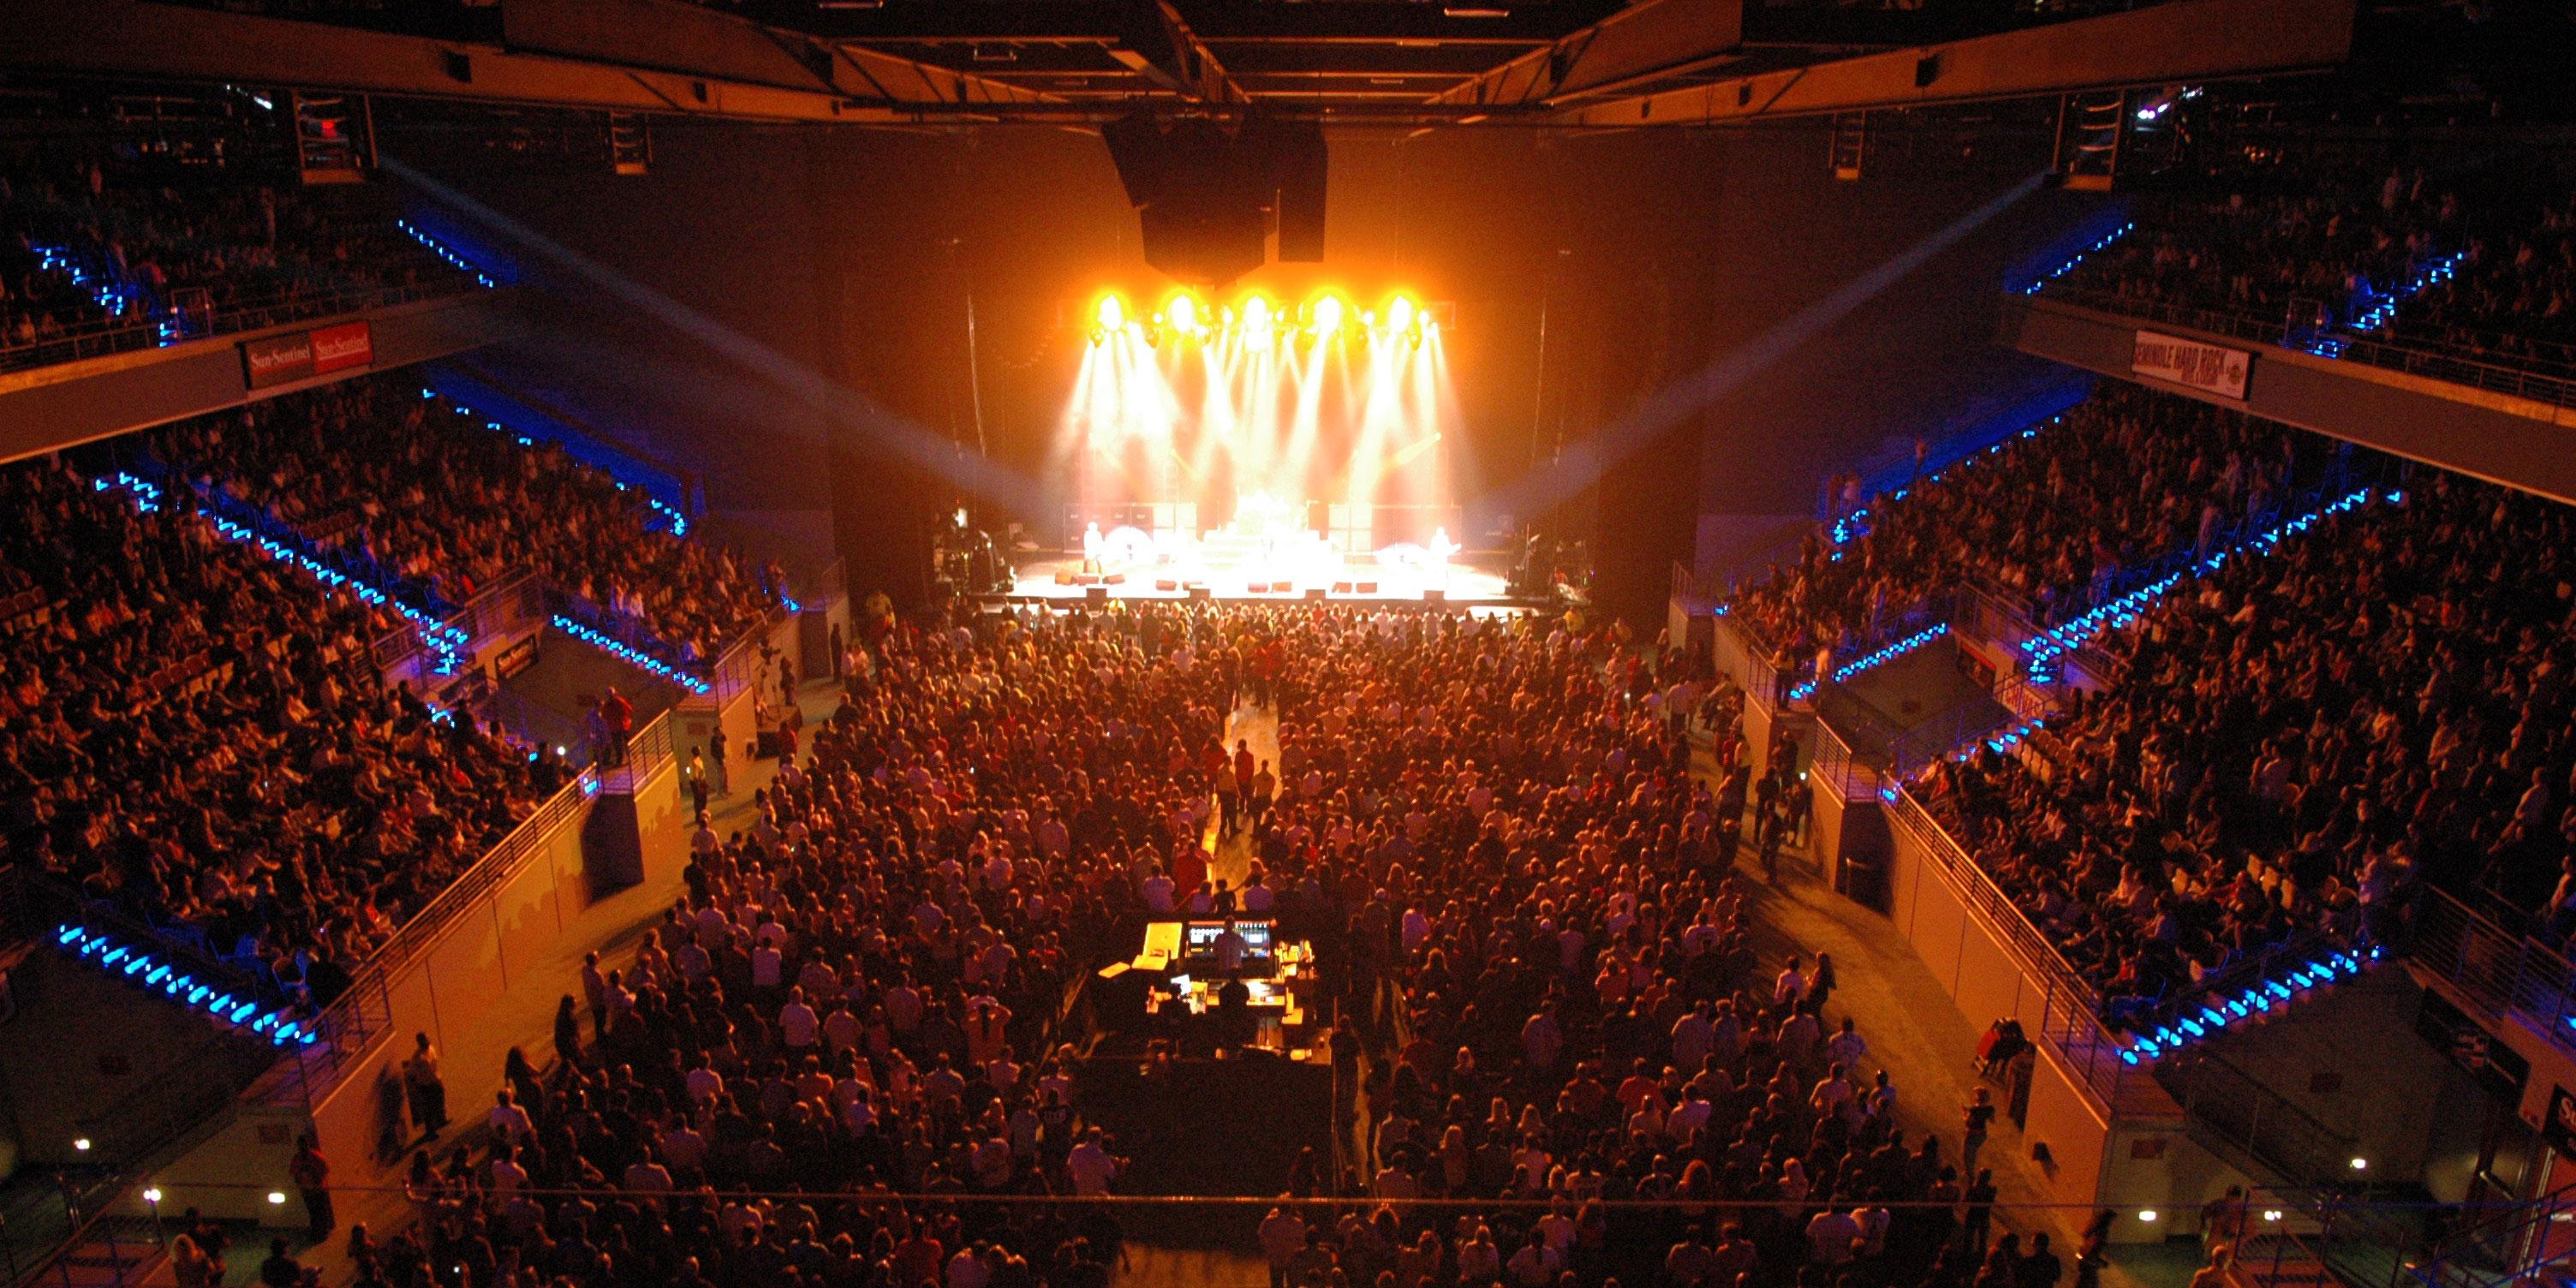 Ft Lauderdale Events January 2020.Fort Lauderdale Events Festivals Shows Concerts